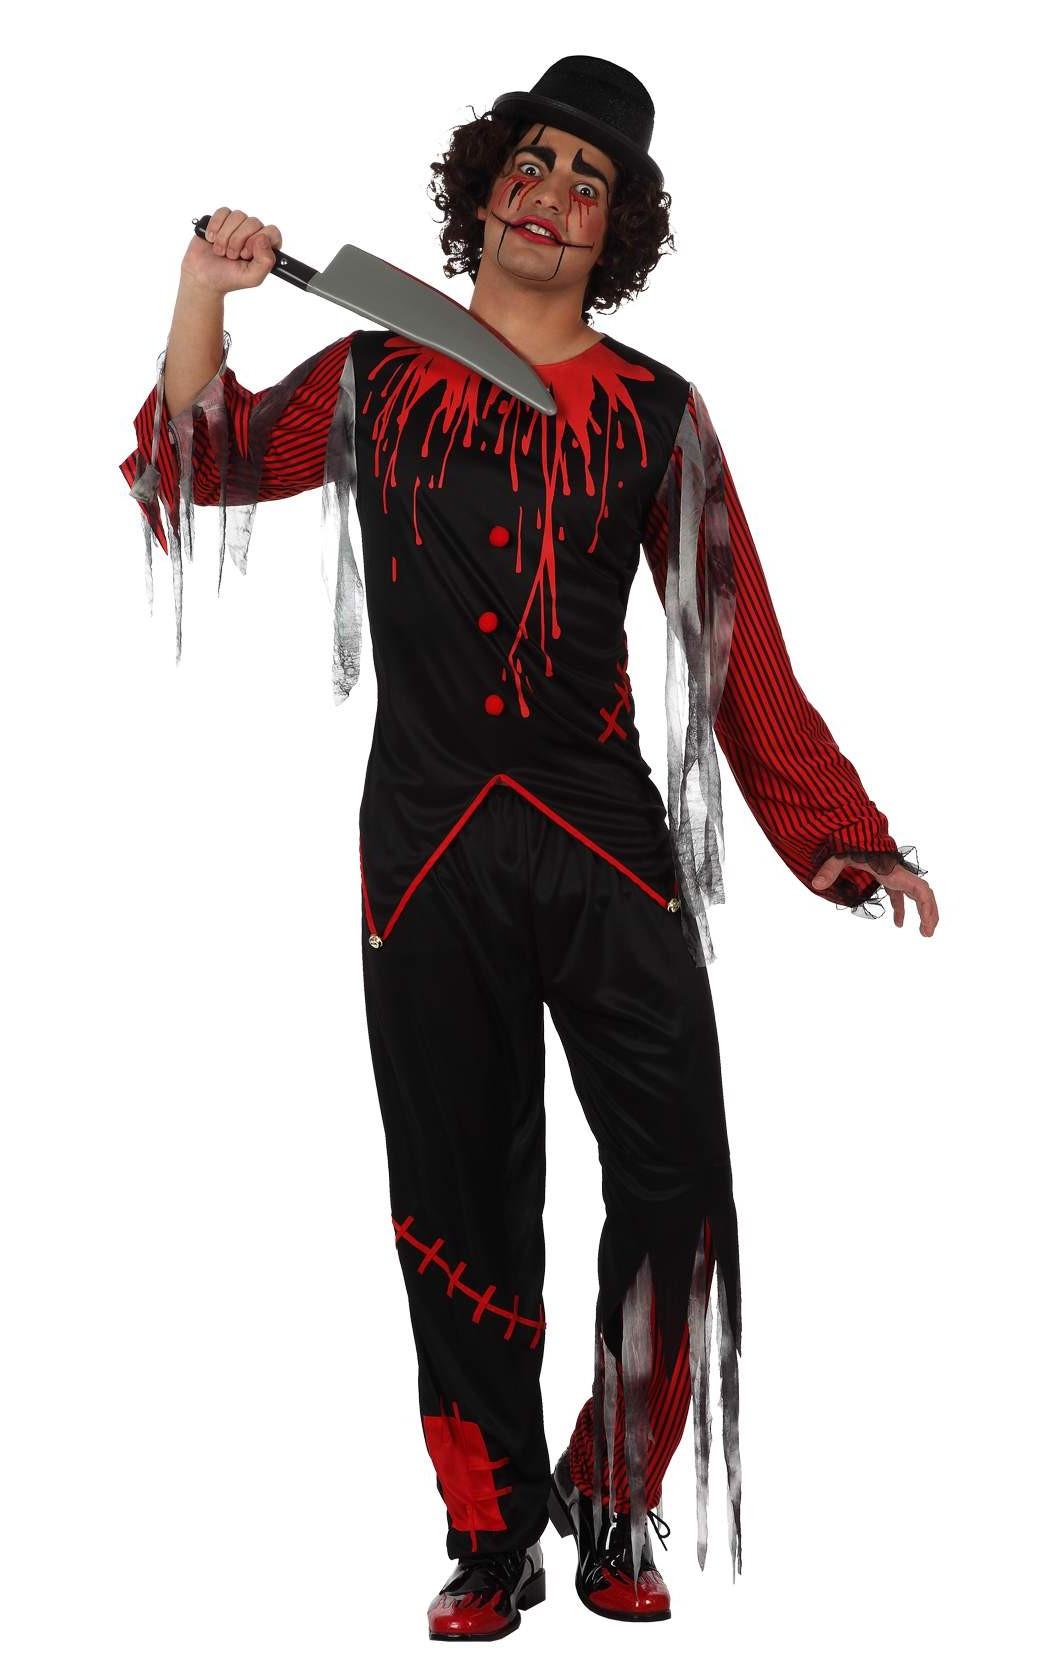 d guisement clown effrayant costume homme pas cher soir e halloween. Black Bedroom Furniture Sets. Home Design Ideas